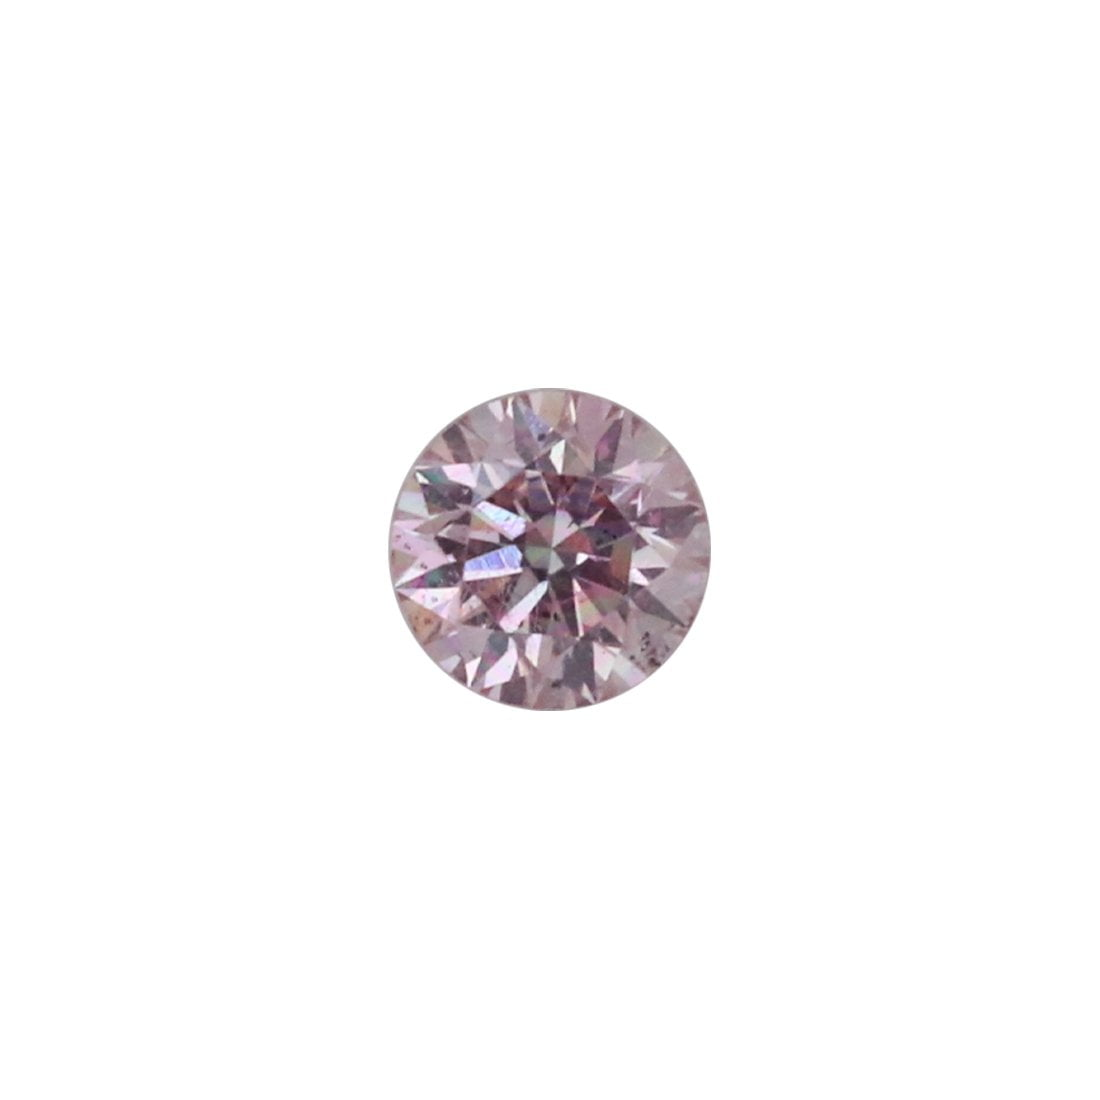 0.10ct Natural Fancy Pink, 7P Argyle Diamond